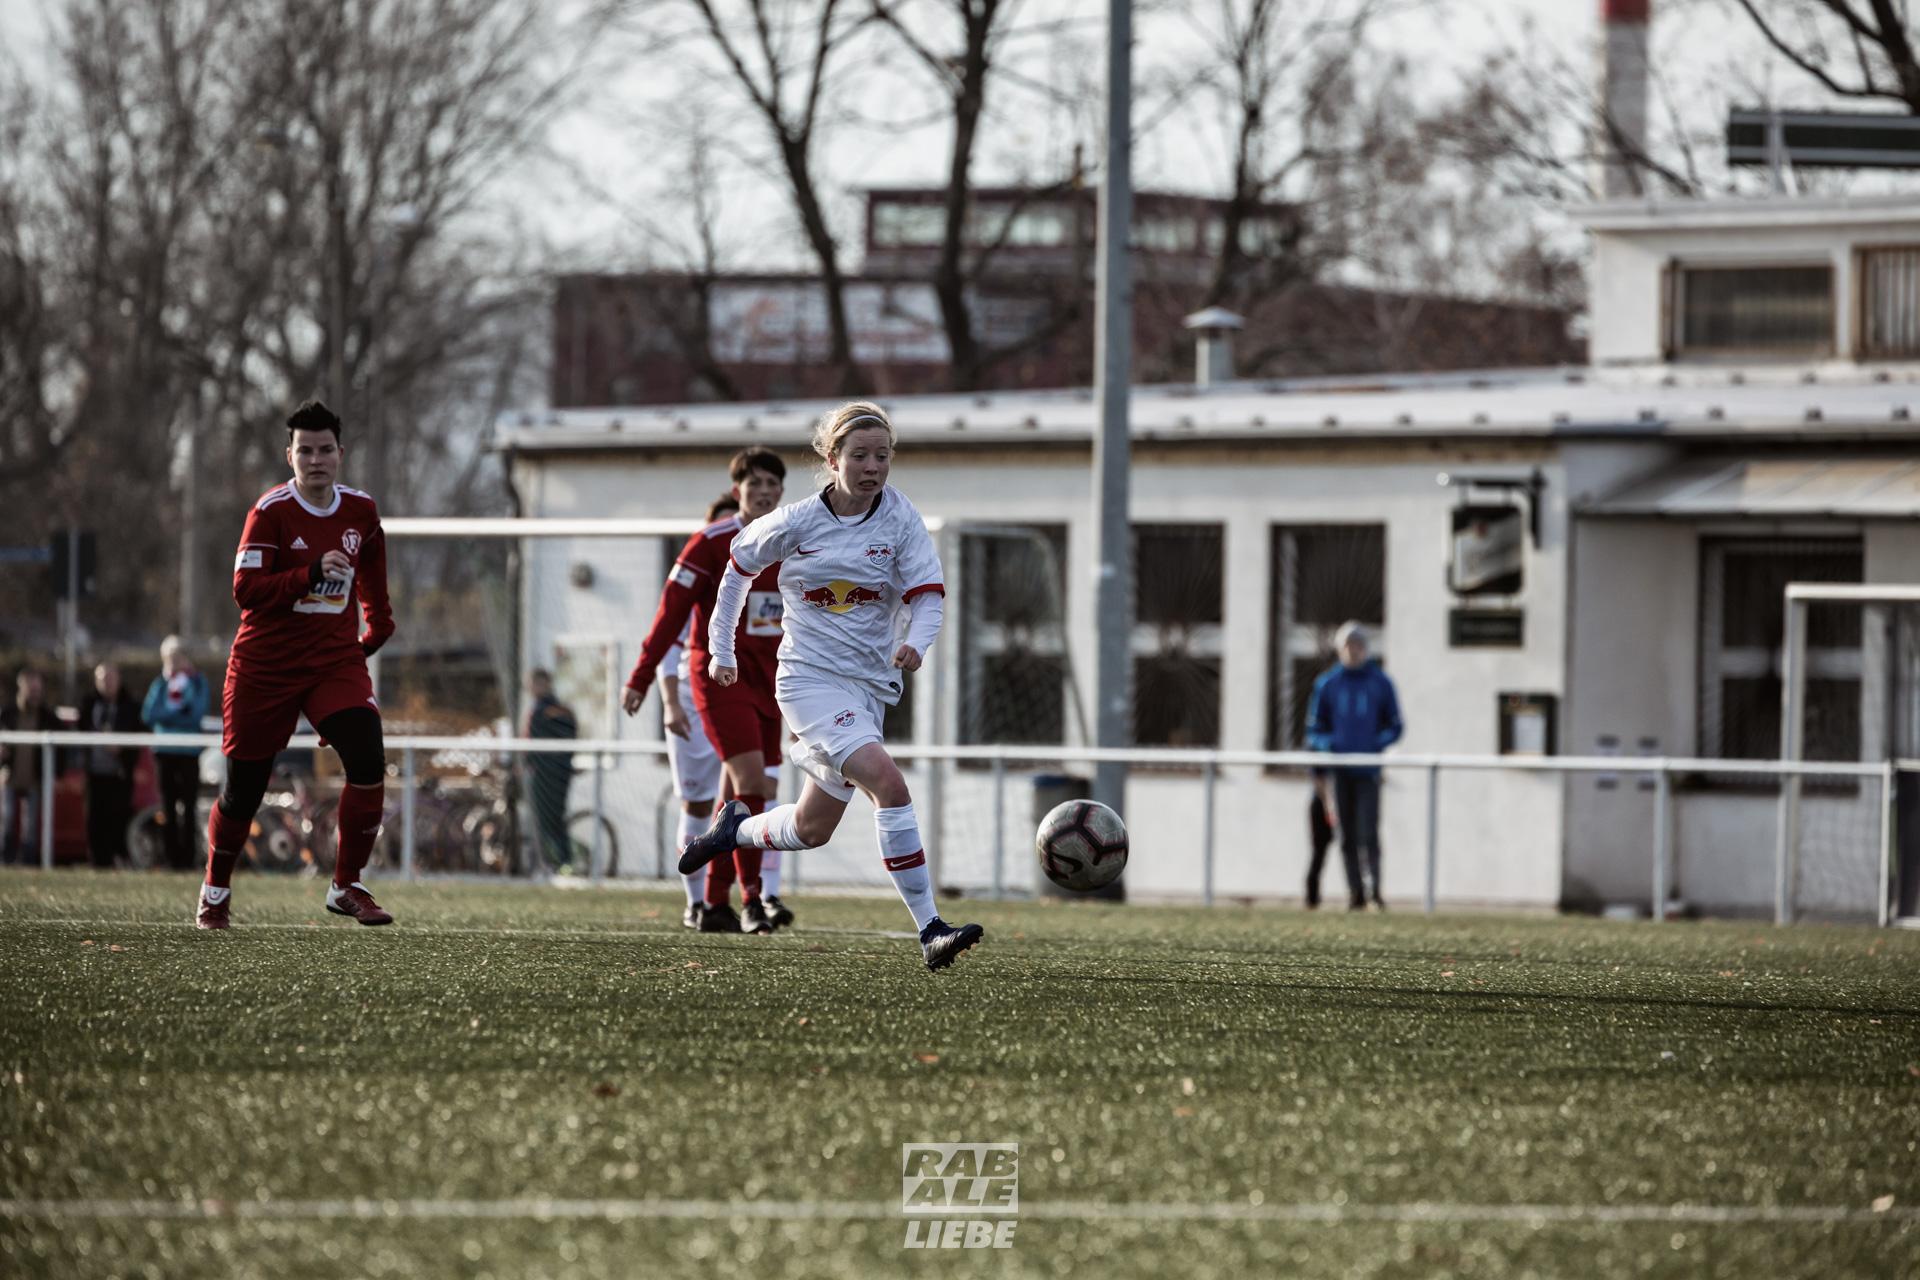 Landesliga Frauen: RB Leipzig II -vs- DFC Westsachsen Zwickau